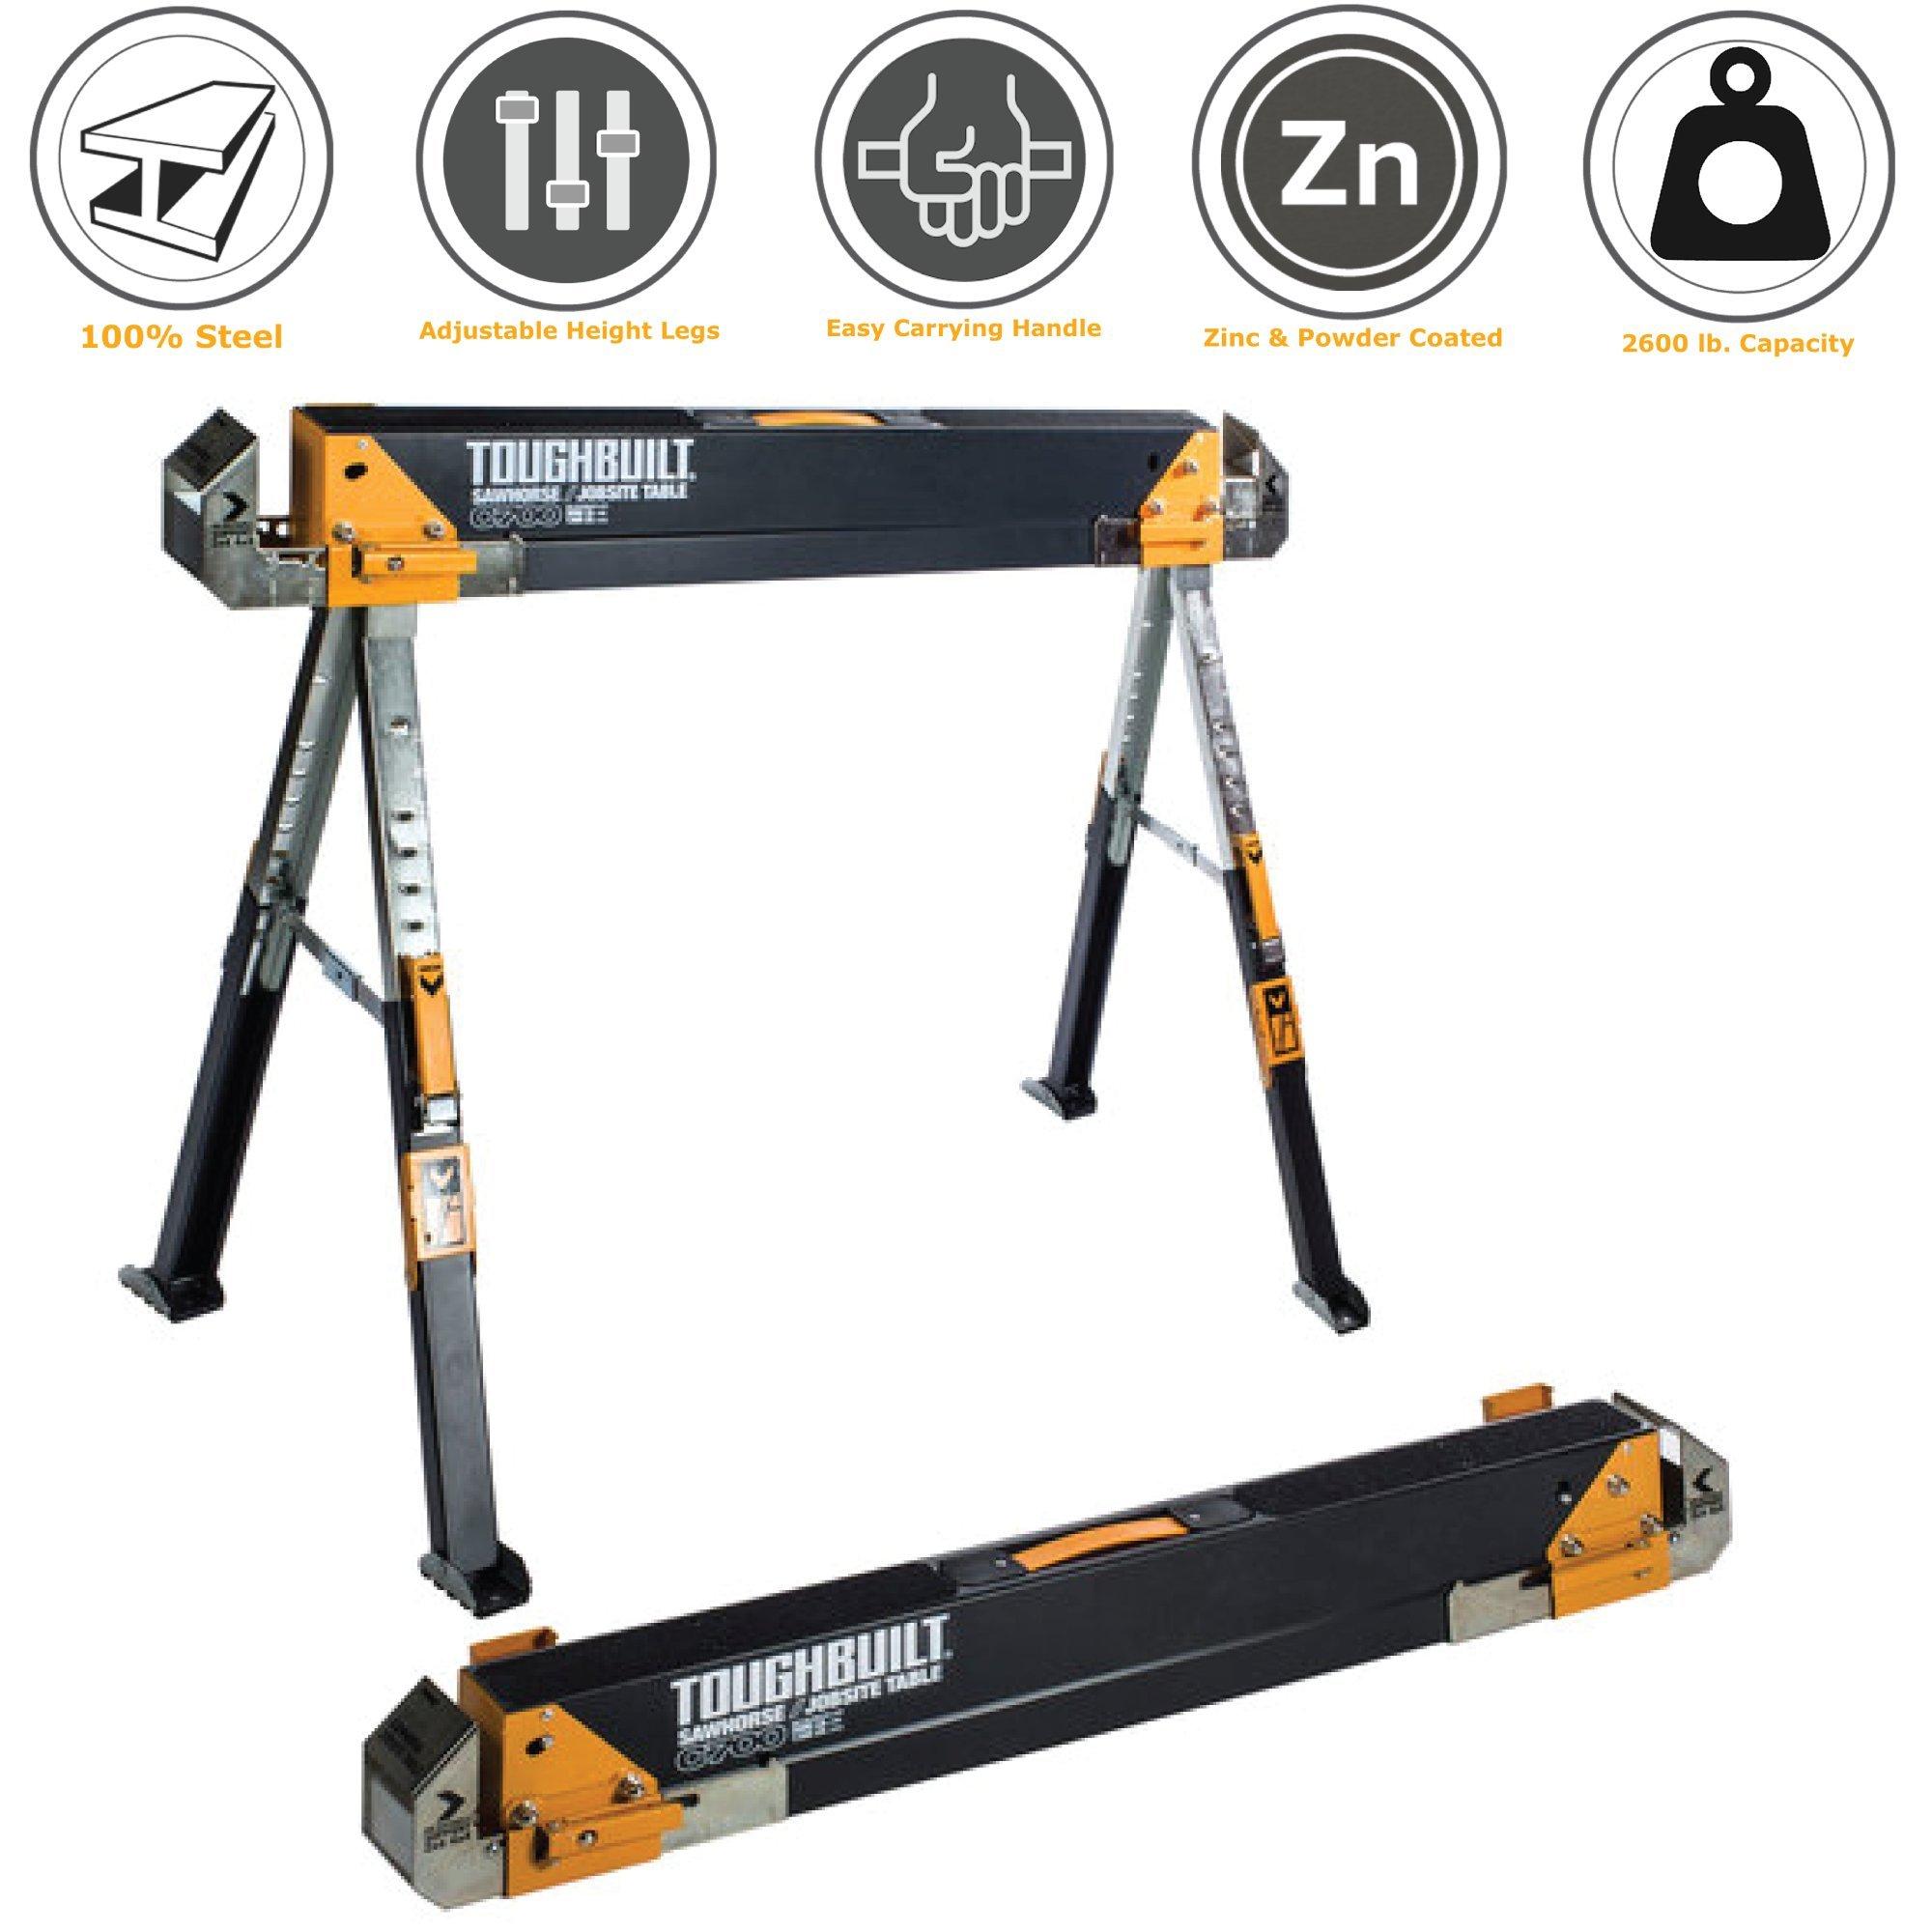 ToughBuilt - Folding Sawhorse/Jobsite Table - Sturdy, Durable, Lightweight, Heavy-Duty, 100% High Grade Steel, 1300lb Capacity, Pivoting Feet, Adjustable Height Legs, Easy Carry Handle (TB-C700) NEW